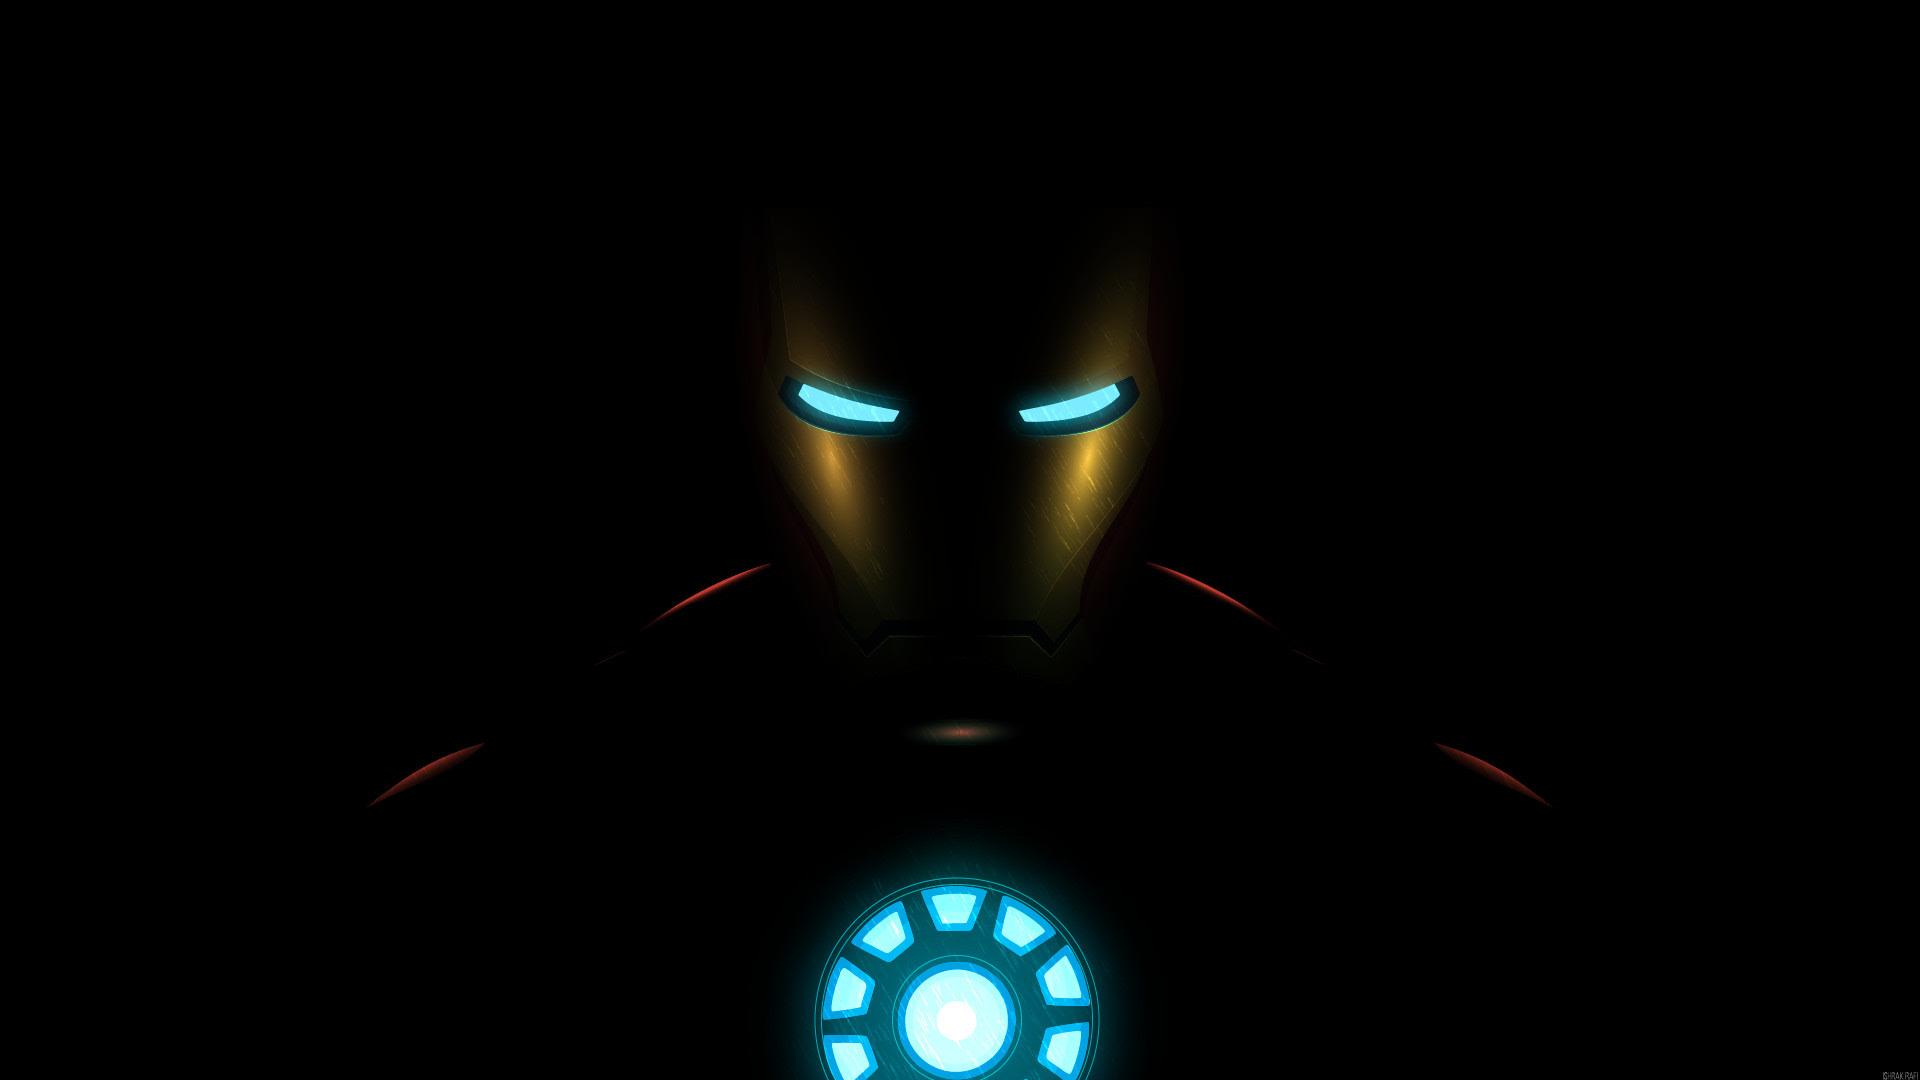 5100 Koleksi Gambar Iron Man Hd Wallpaper Gratis Terbaru